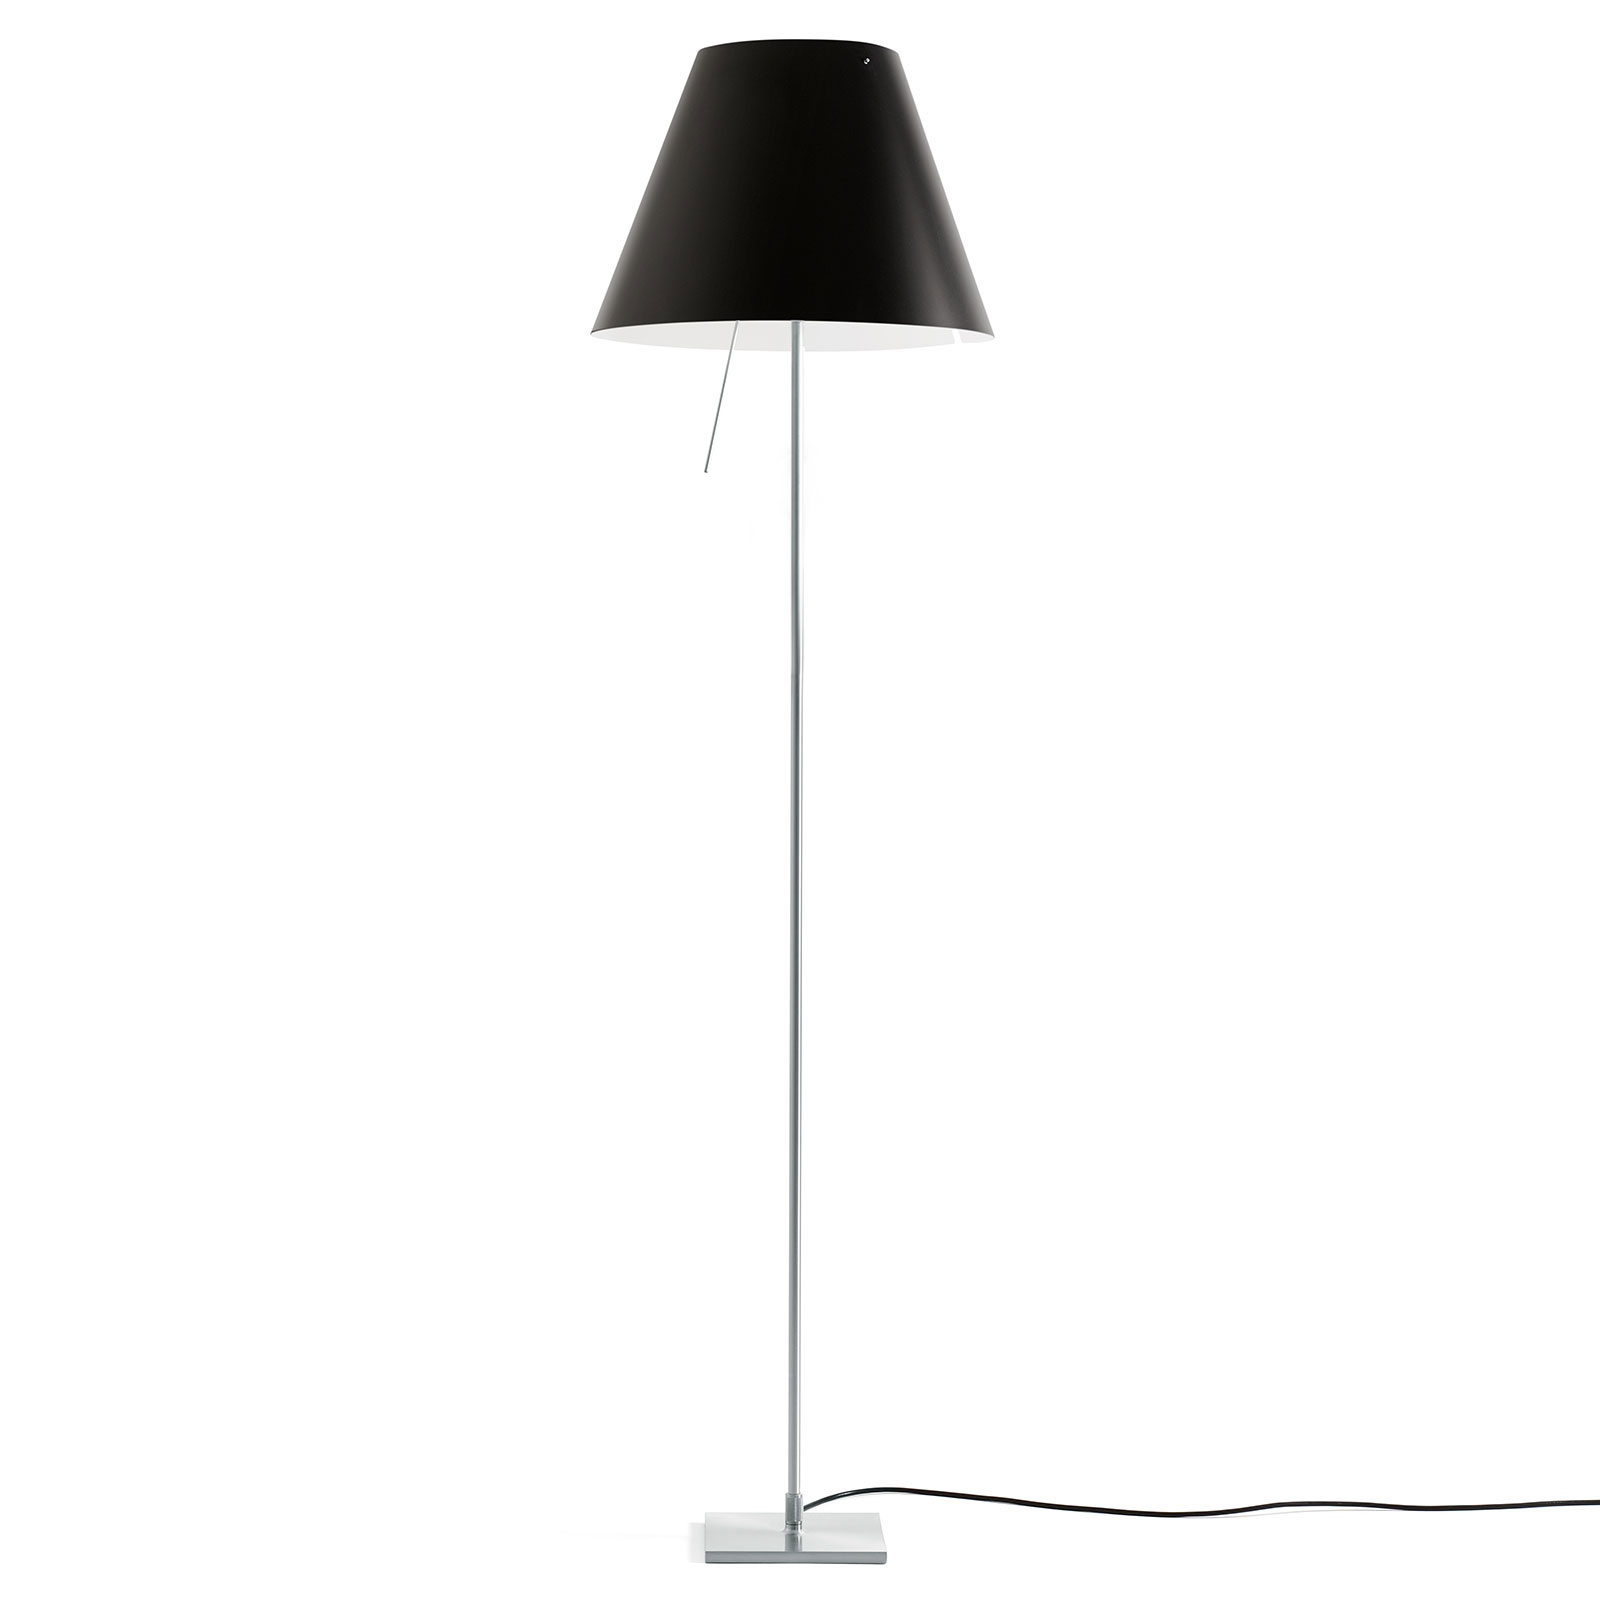 Luceplan Costanza lampa stojąca D13tif, czarna